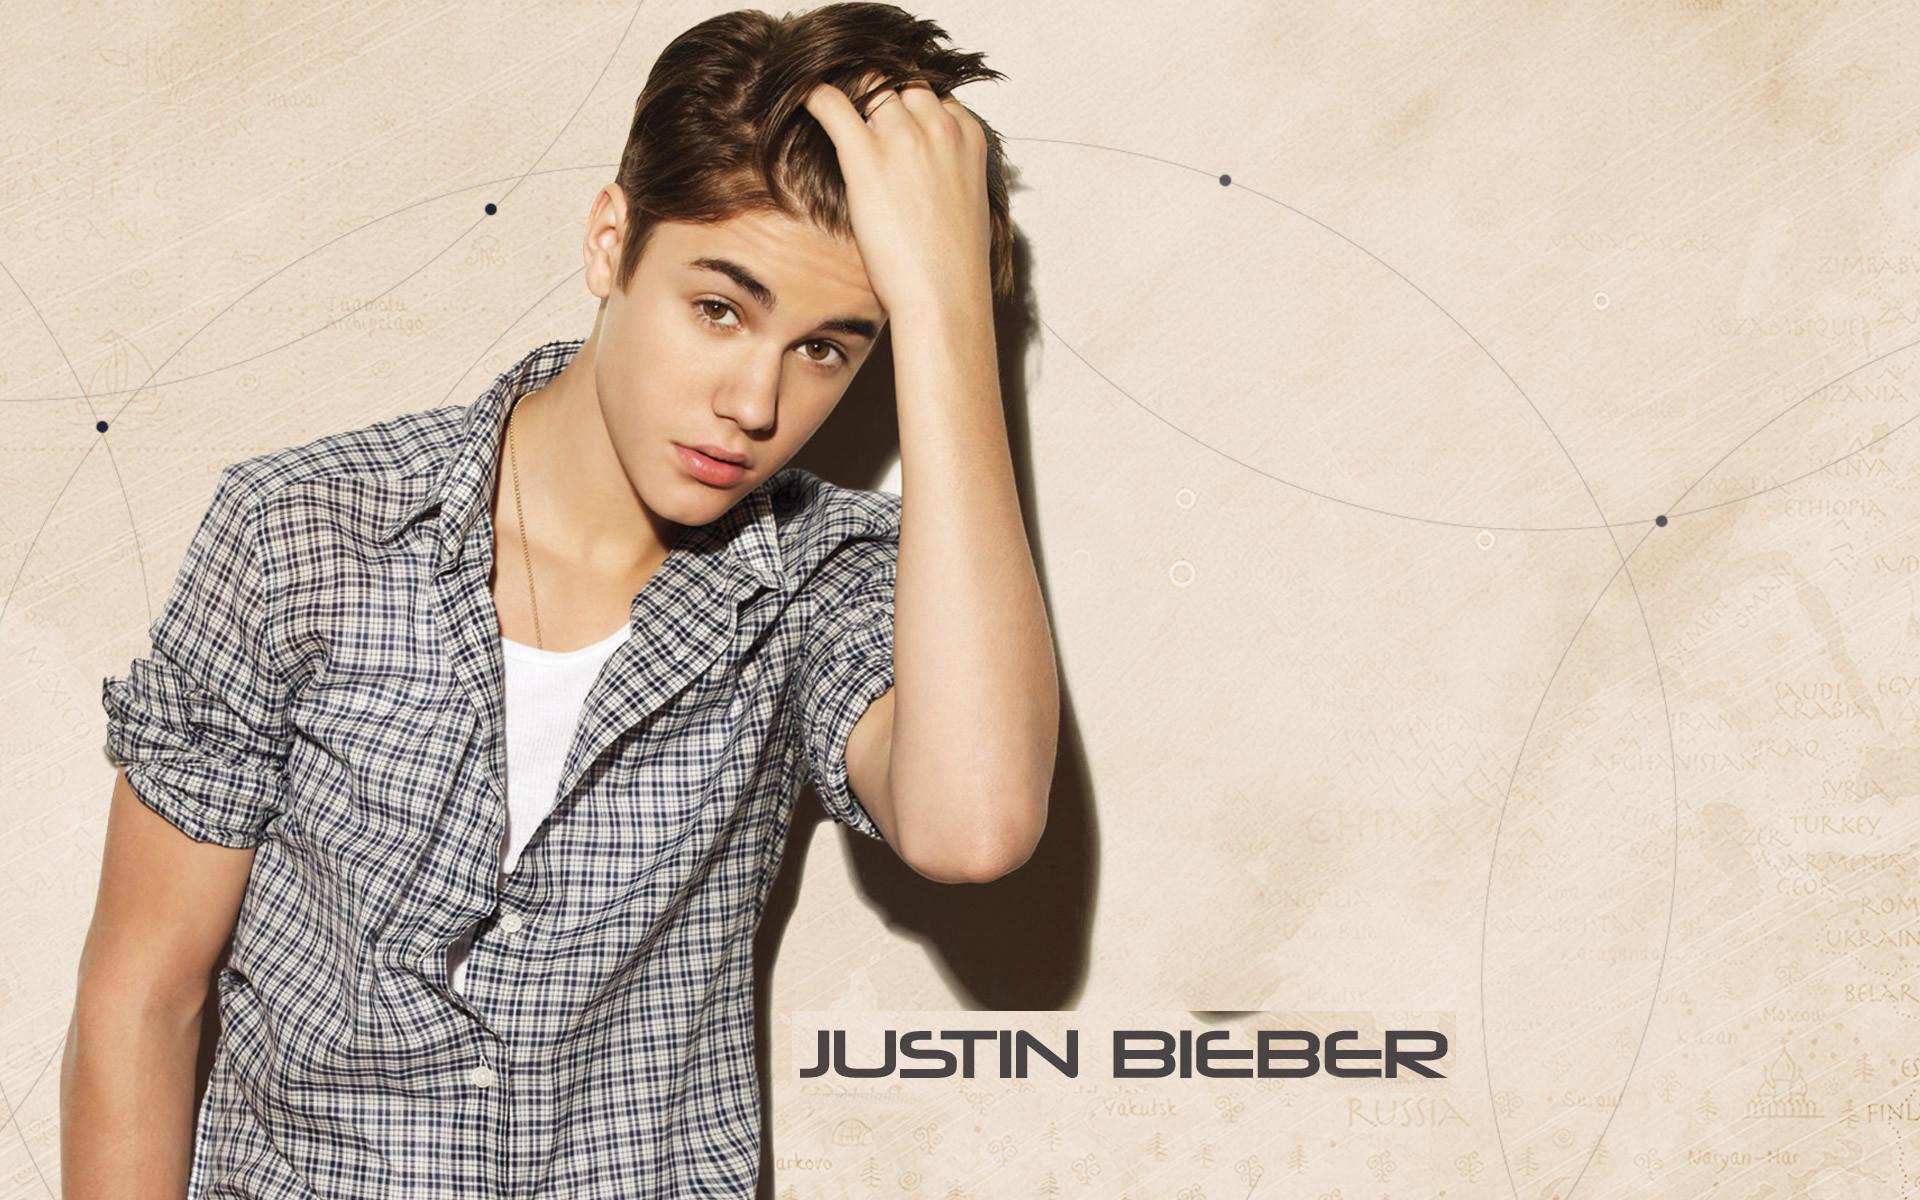 Justin Bieber 2013 Cool Wallpaper: Wallpaper Of Justin Bieber 2018 ·① WallpaperTag